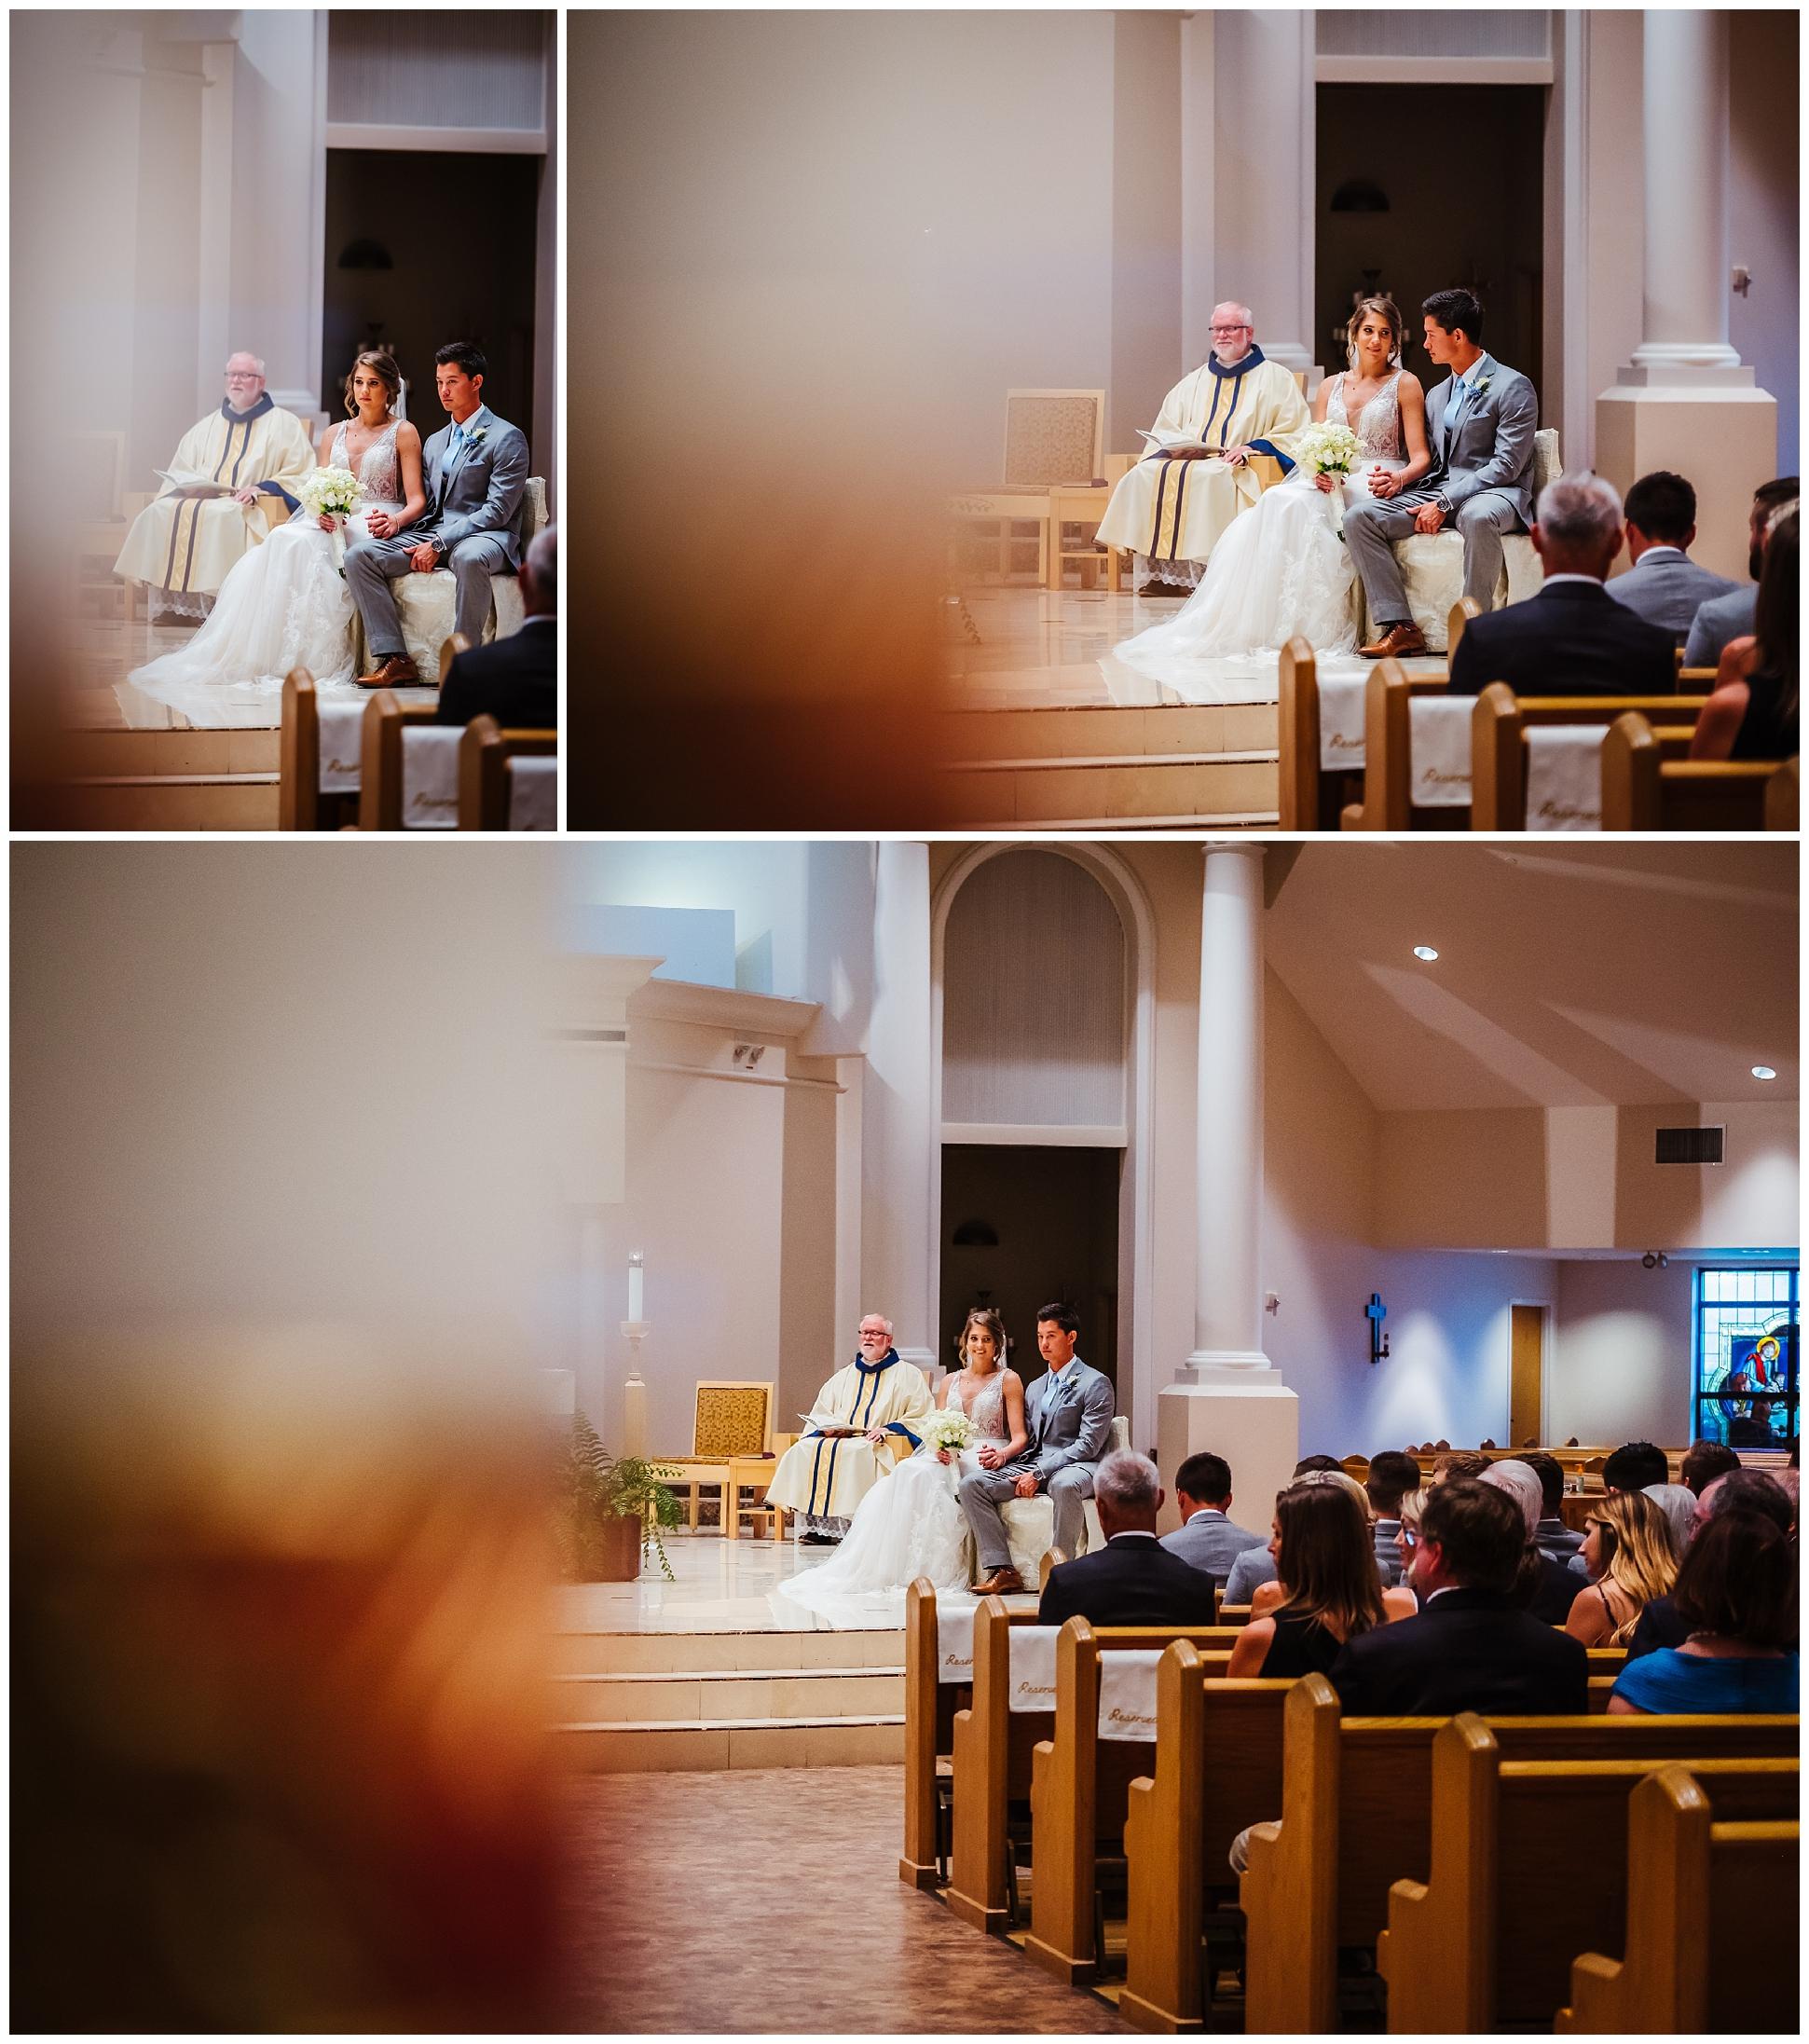 mahaffey-theater-big-military-wedding-st-pete-photographer-blue_0032.jpg